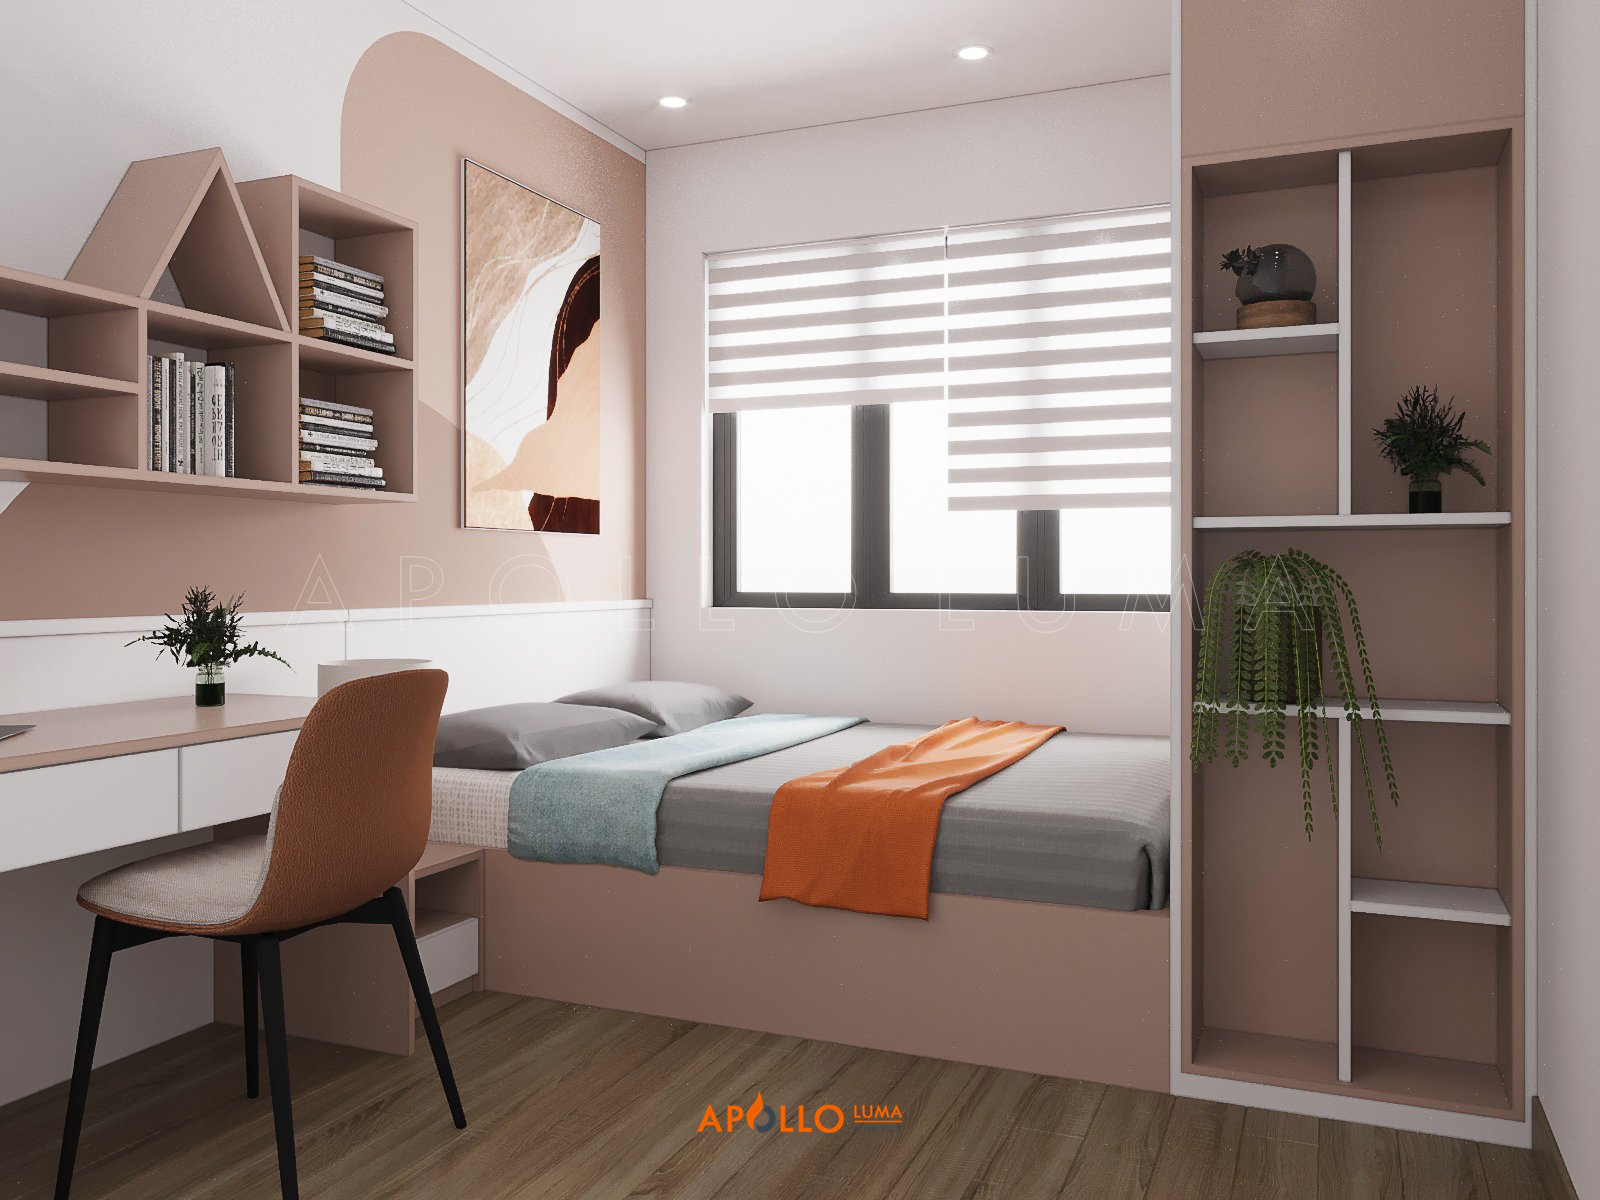 Thiết kế nội thất căn 3PN (75m2) S2.06-22 Vinhomes Ocean Park